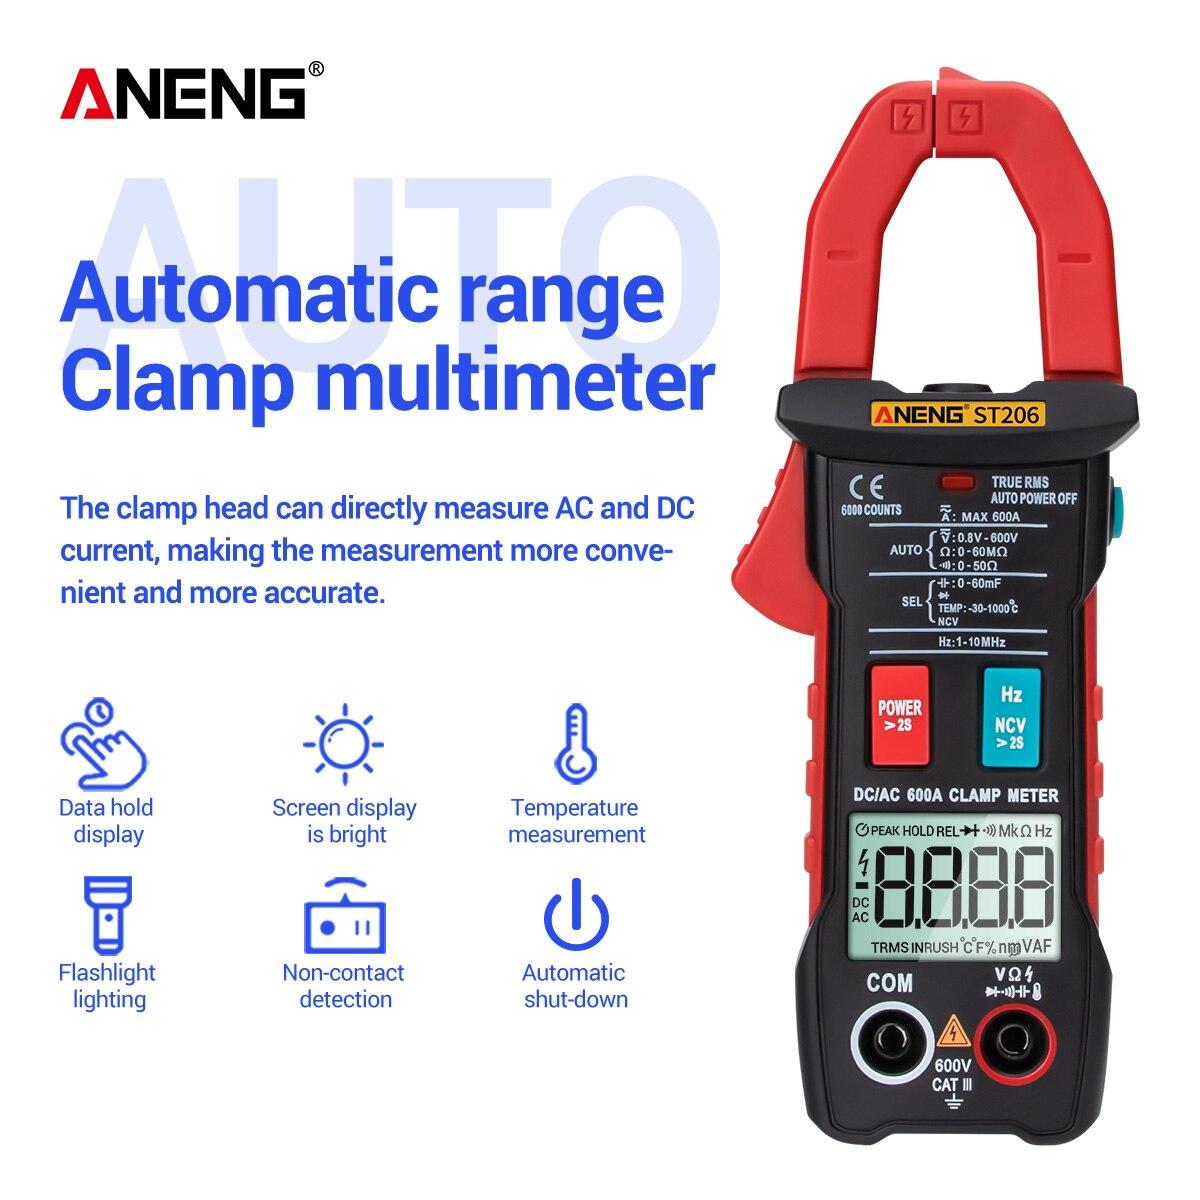 ST206 Clamp Meter  Digital Multimeter 6000 counts True RMS Amp DC/AC Current Clamp tester Power Meters voltmeter Test|Multimeters| |  - title=